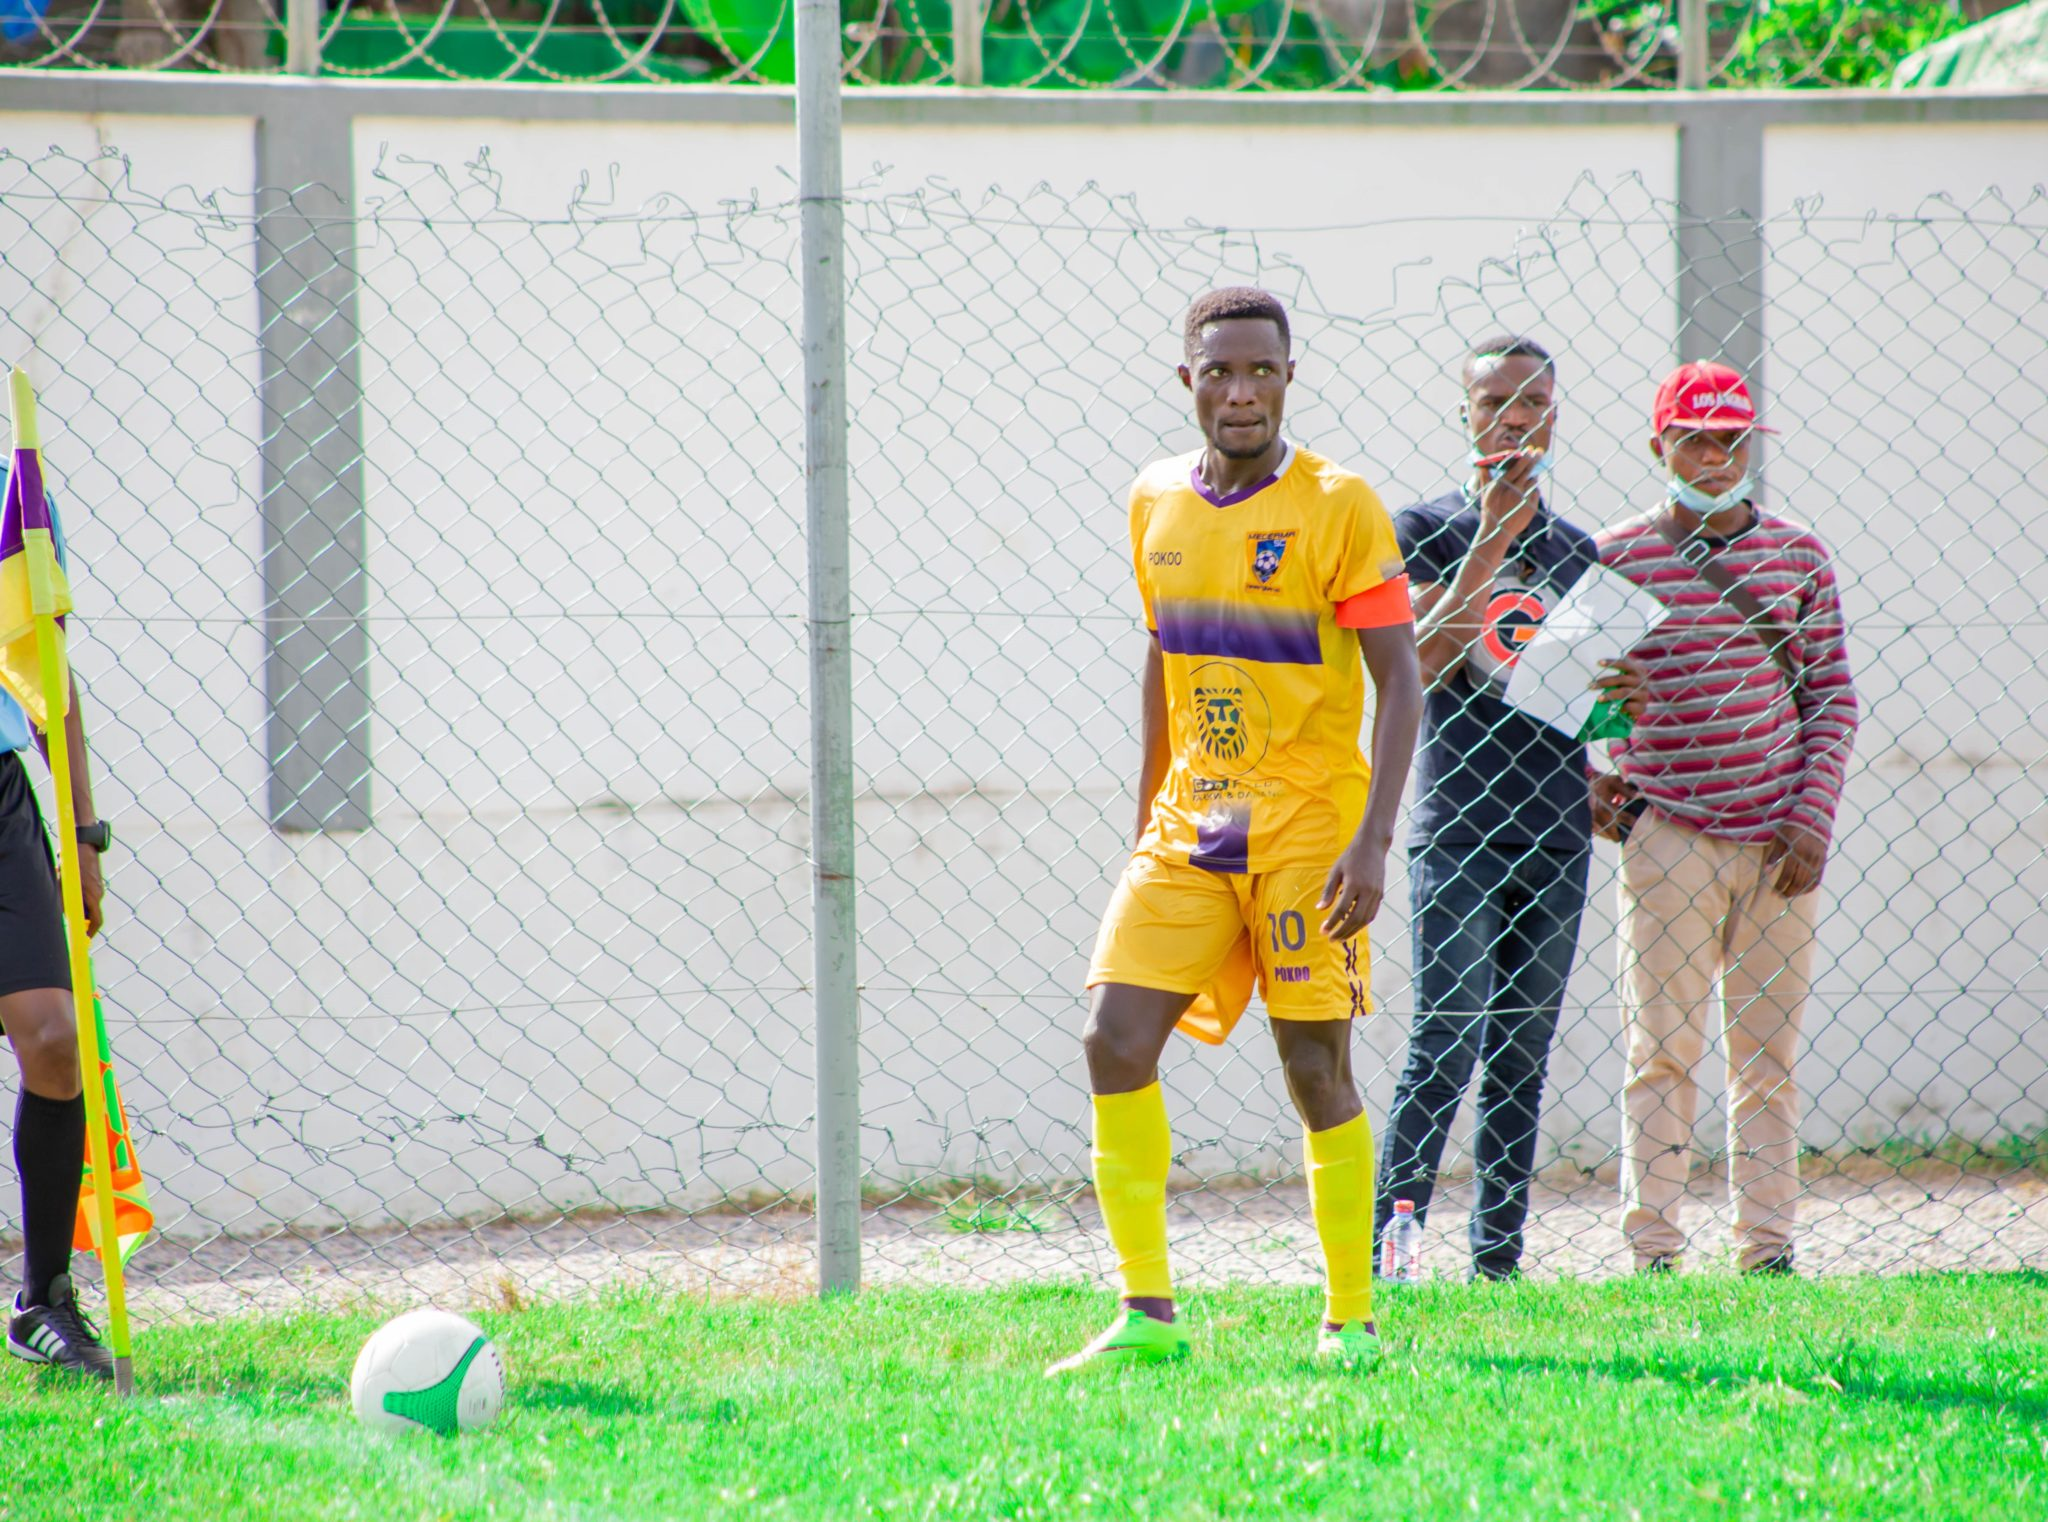 2020/21 Ghana Premier League: Joseph Tetteh Zutah steering the Medeama Wheel